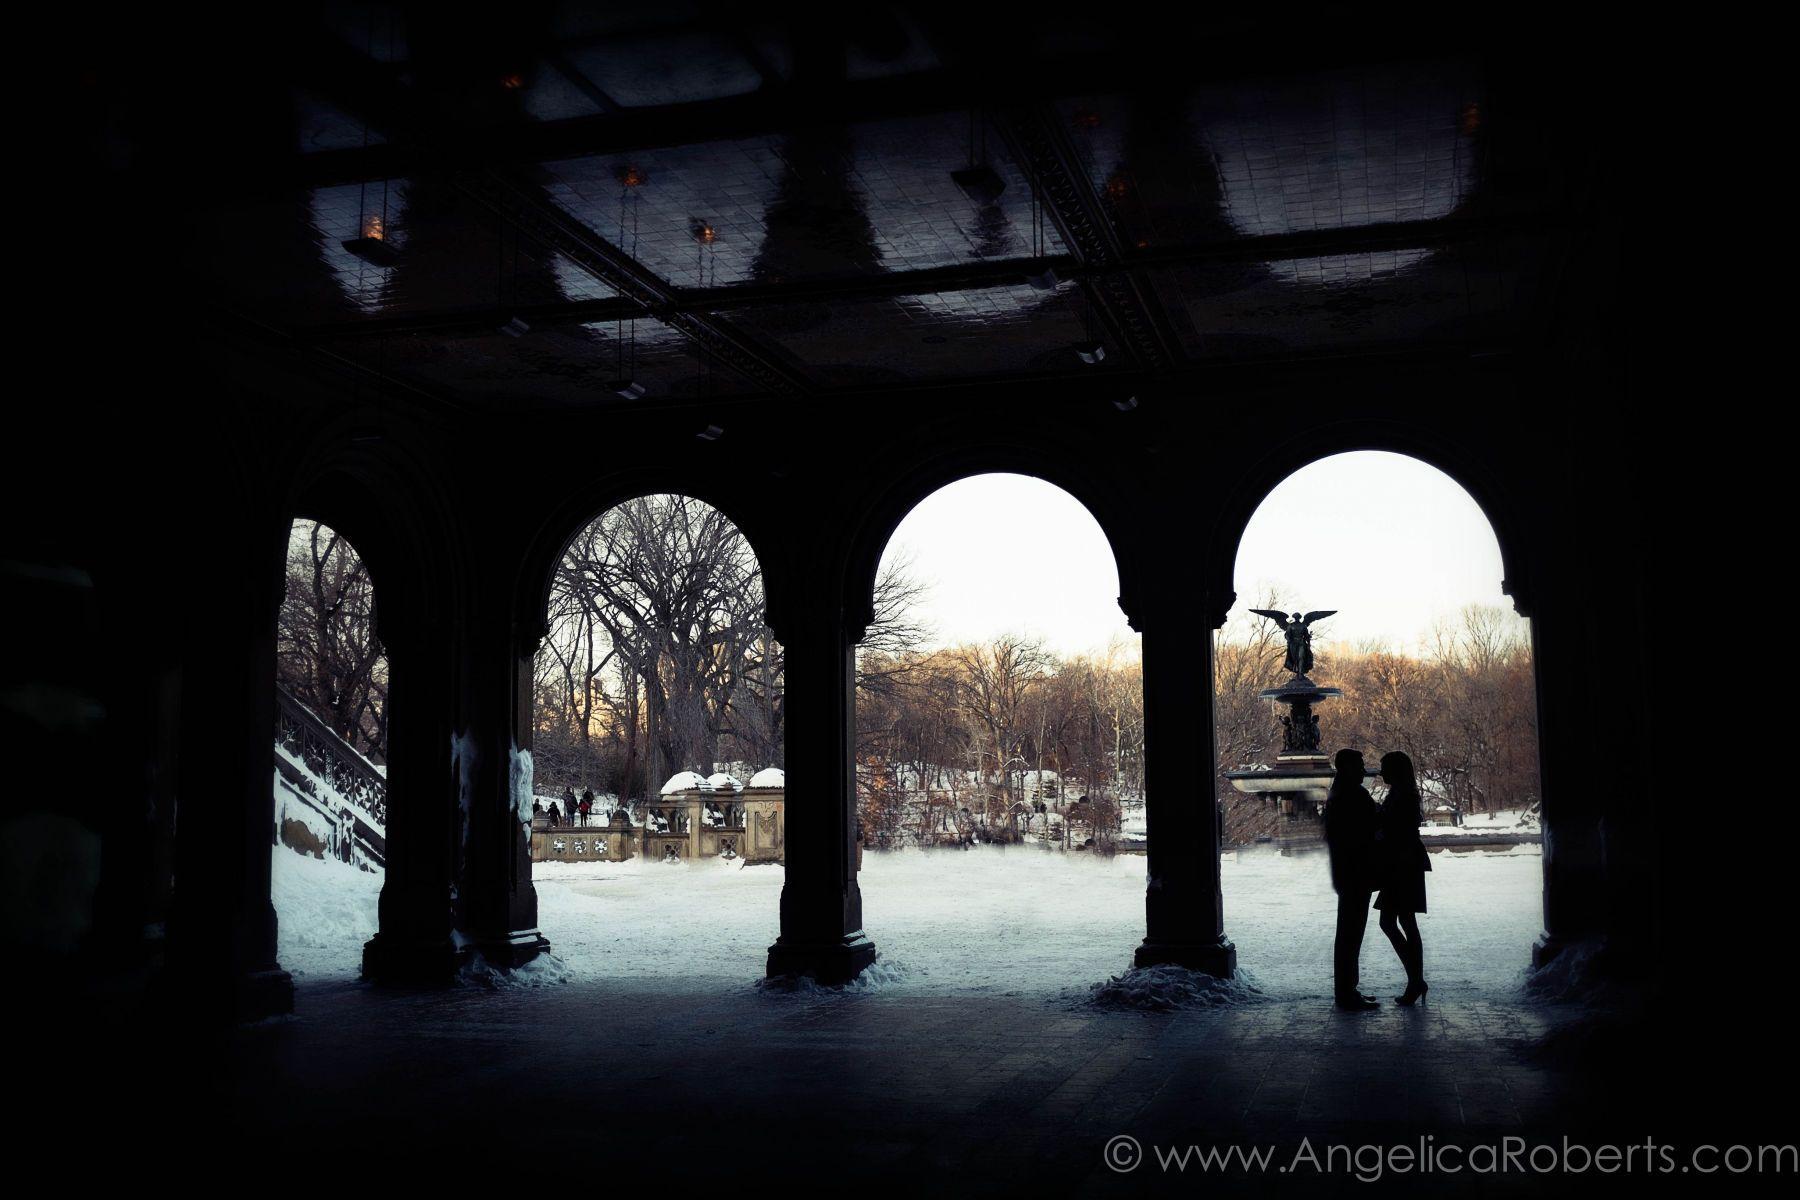 Bethesda Terrace - Central Park engagement photography